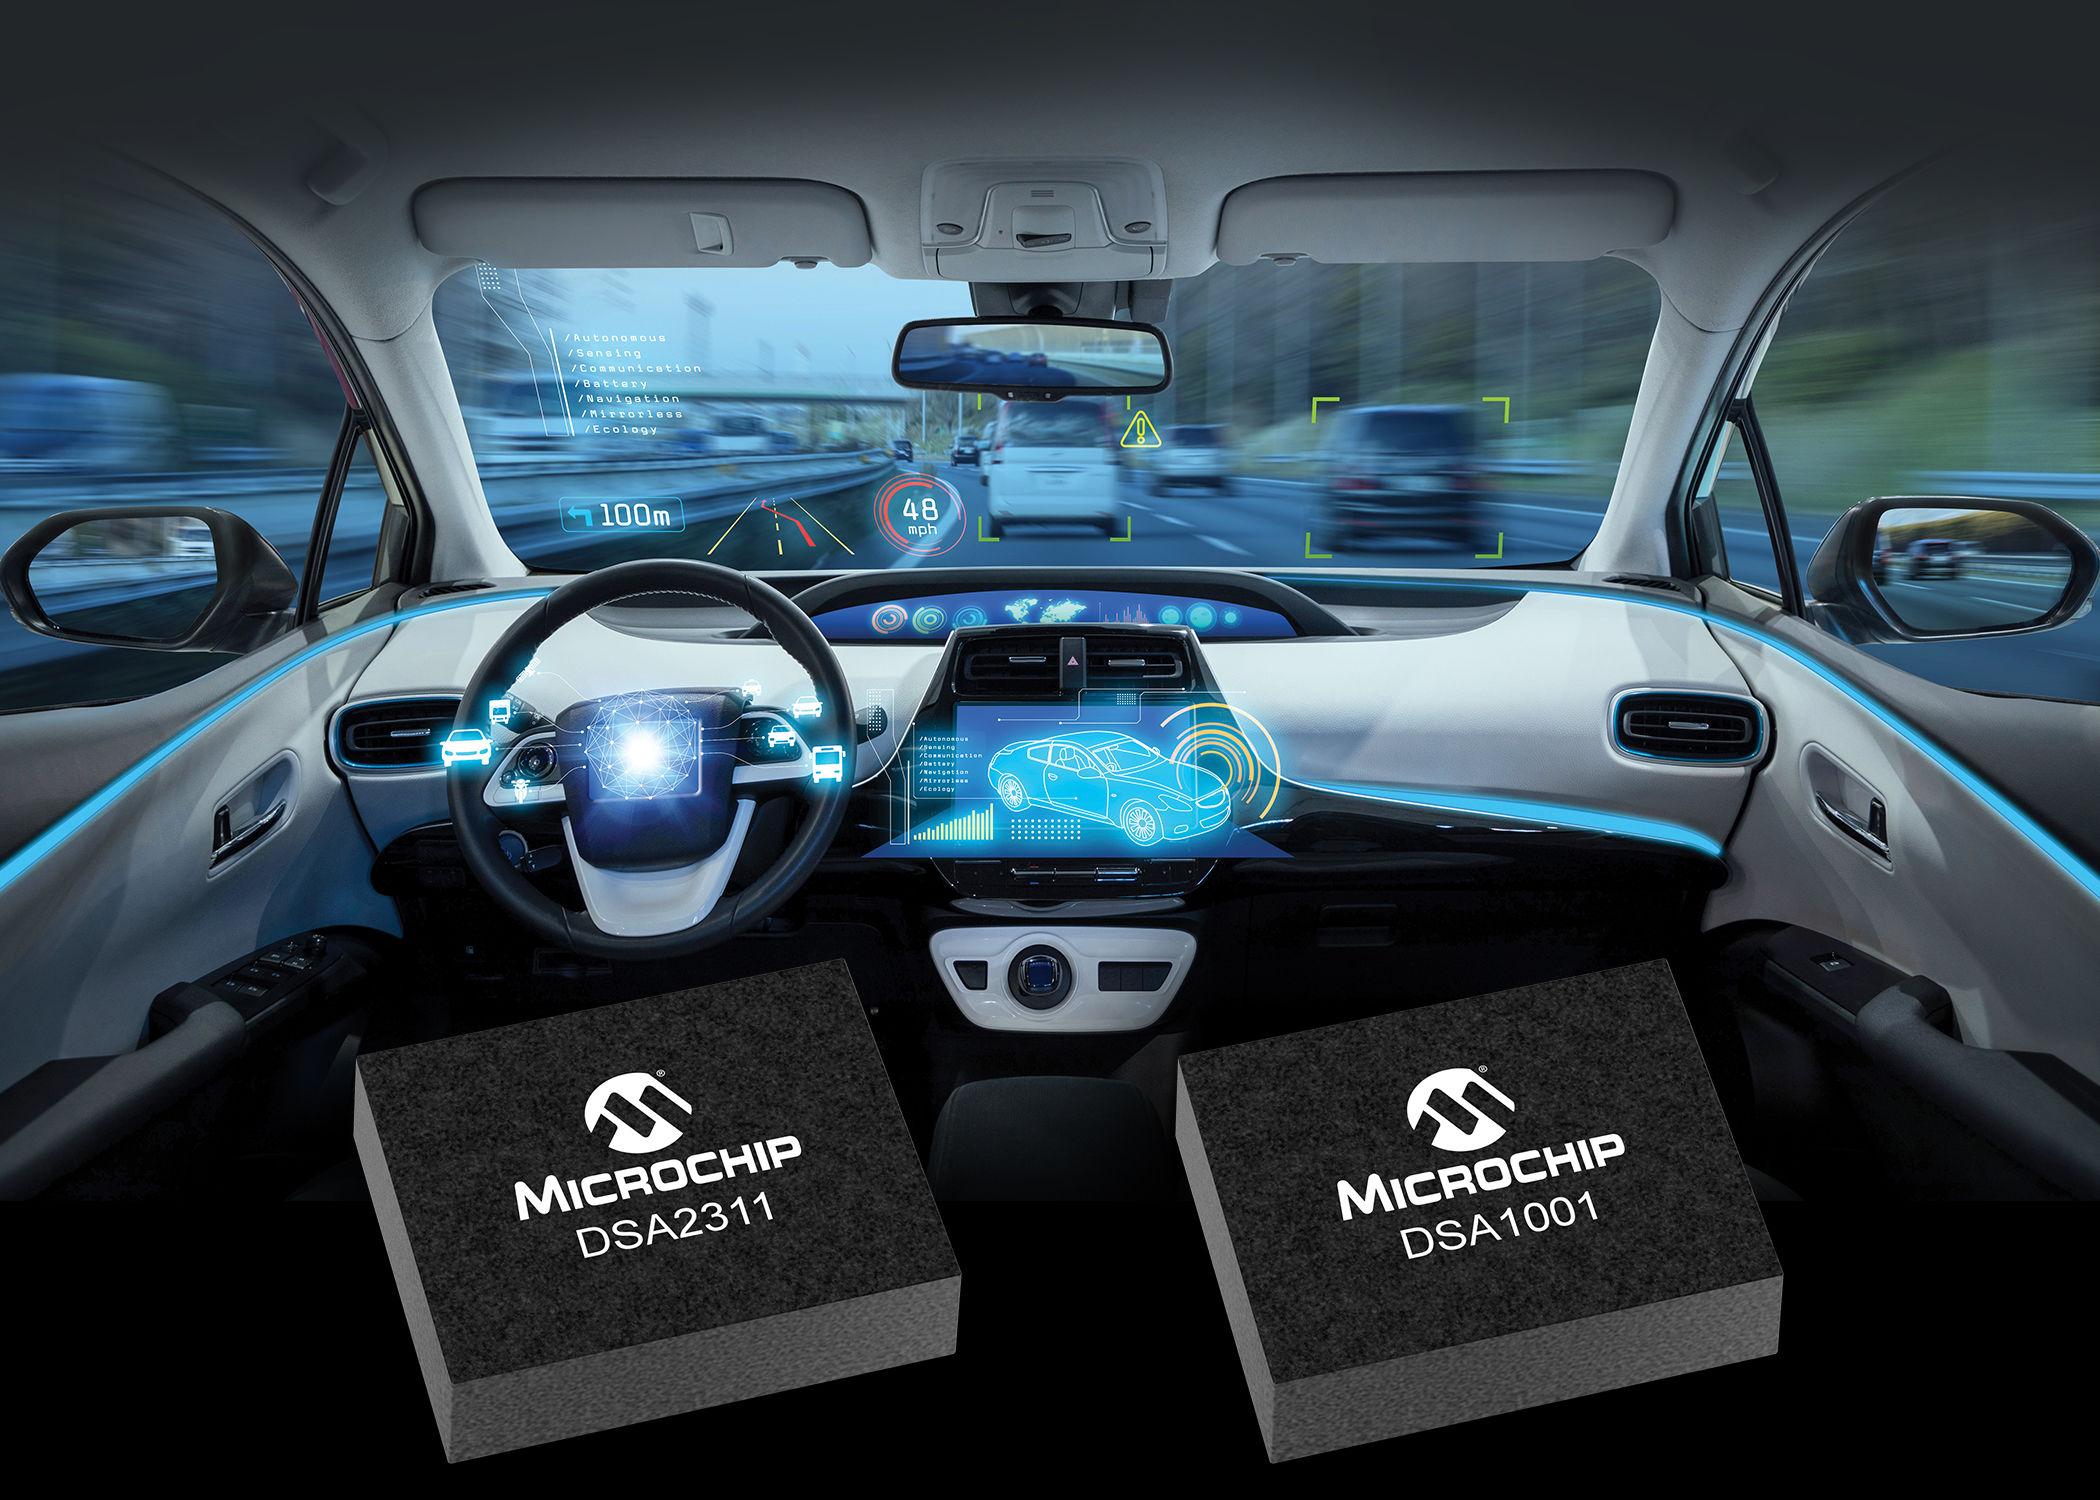 BMW: Σε δυο χρόνια θα λυθεί το πρόβλημα με τα microchip